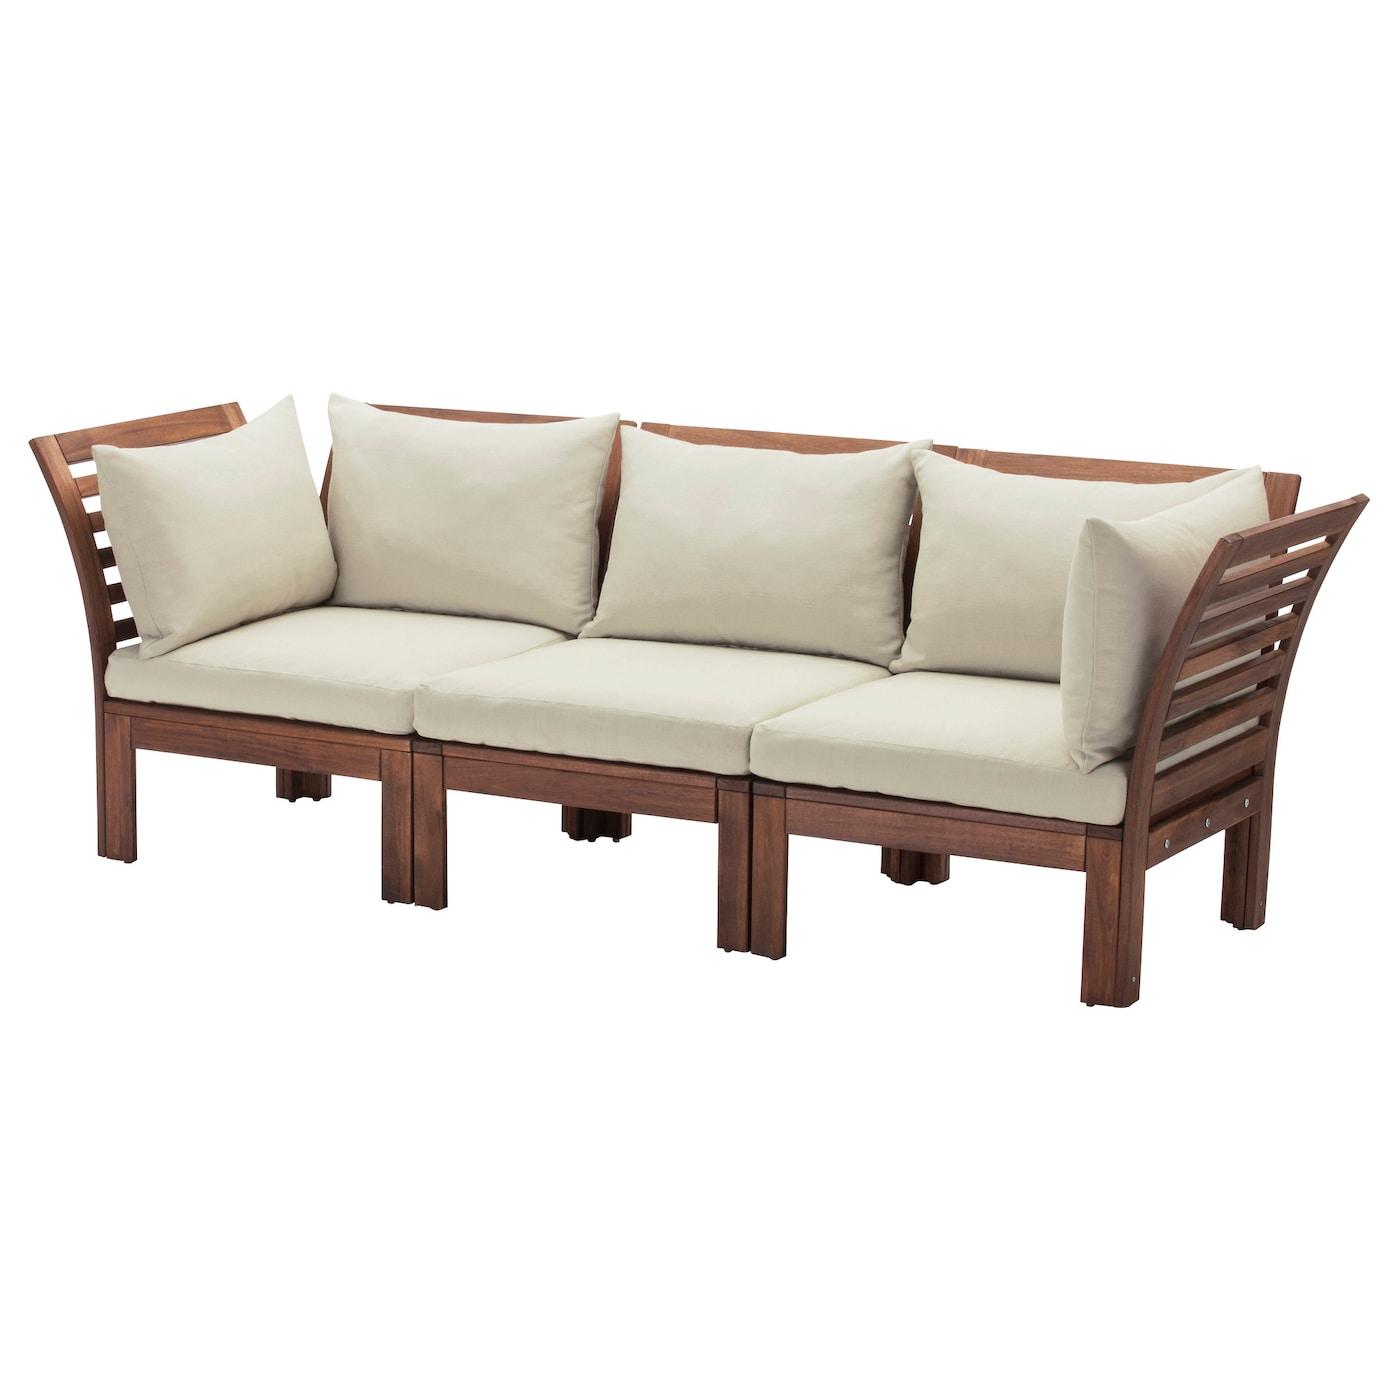 ÄPPLARÖ, 3er-Sofa/außen, braun braun las., braun 890.203.54